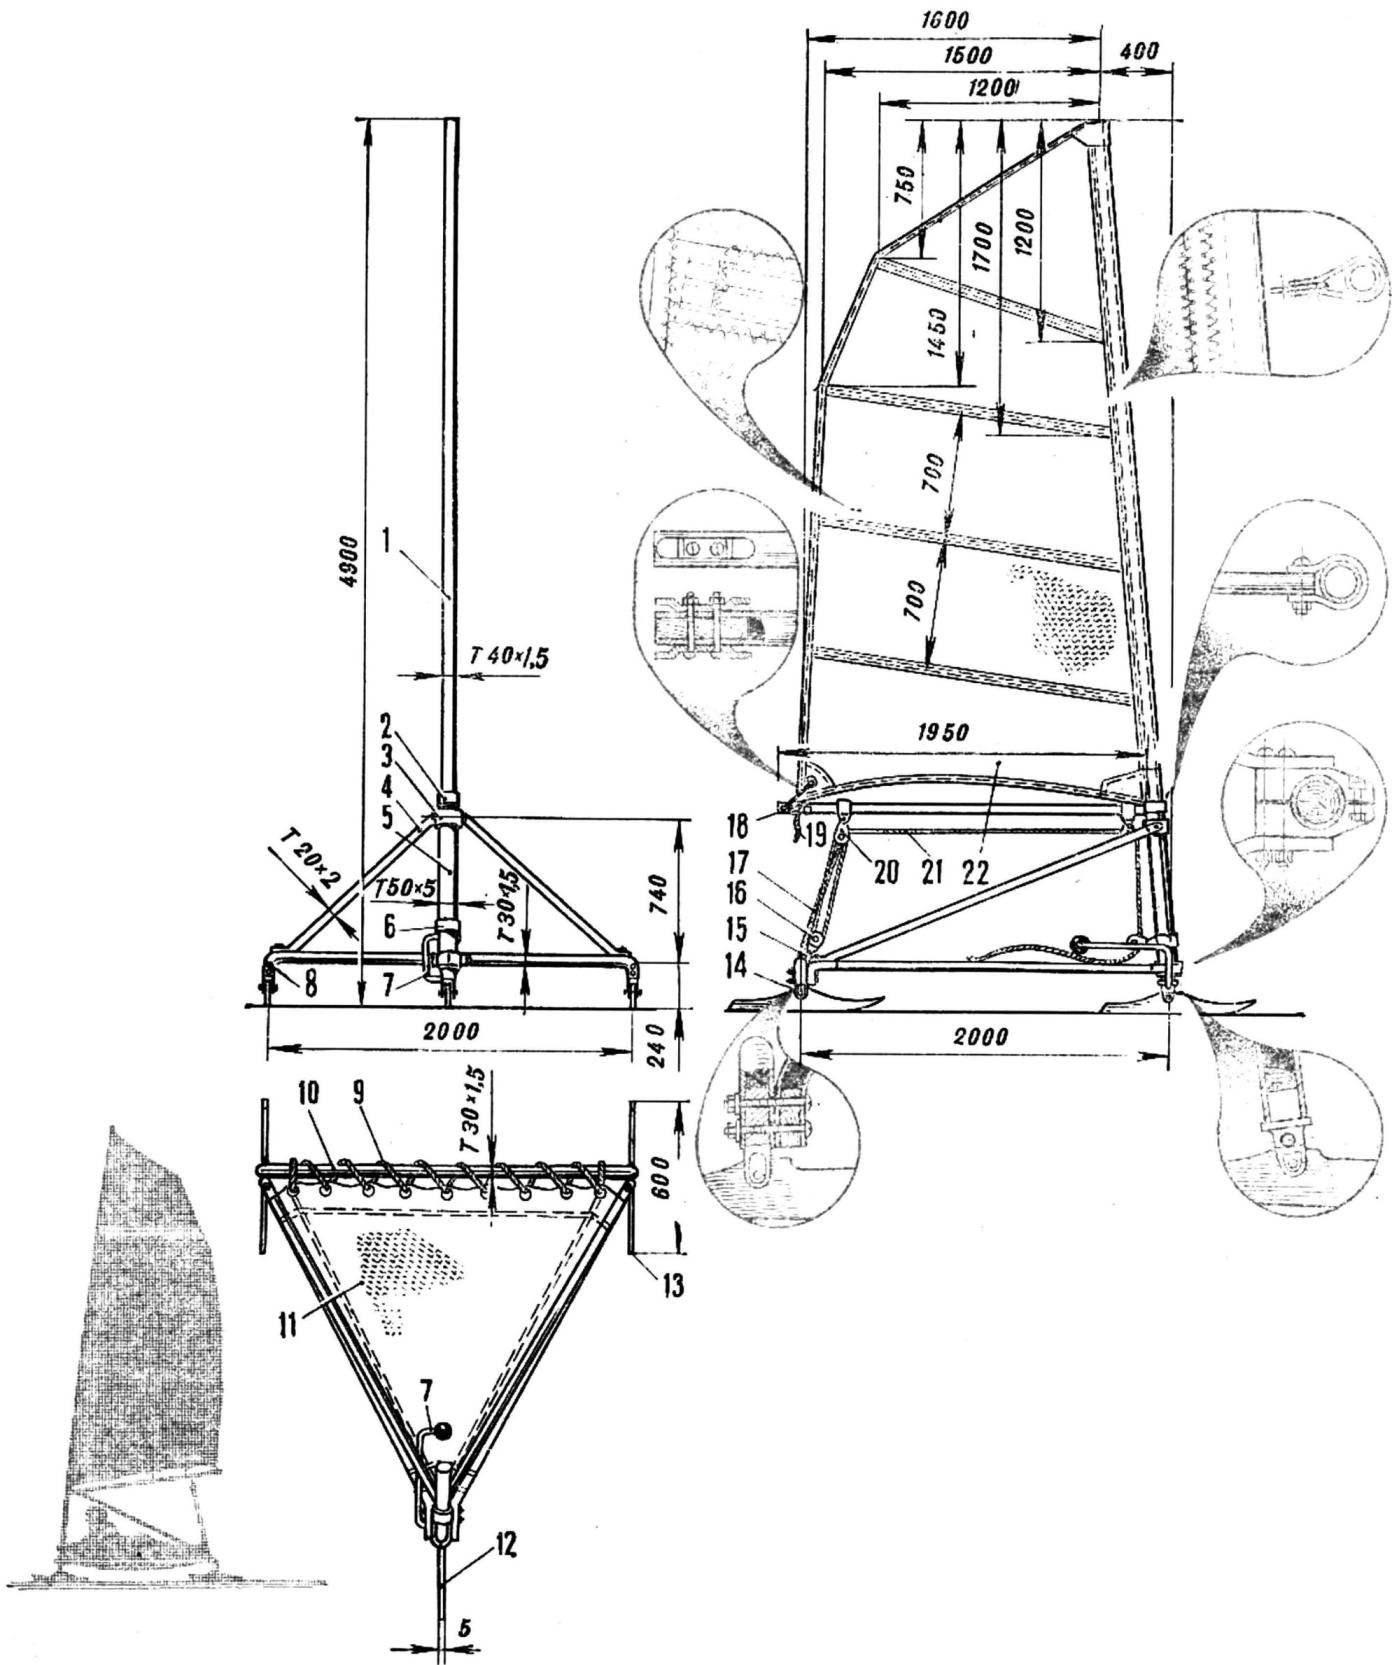 Рис. 1. Общий вид буера «Тетра»